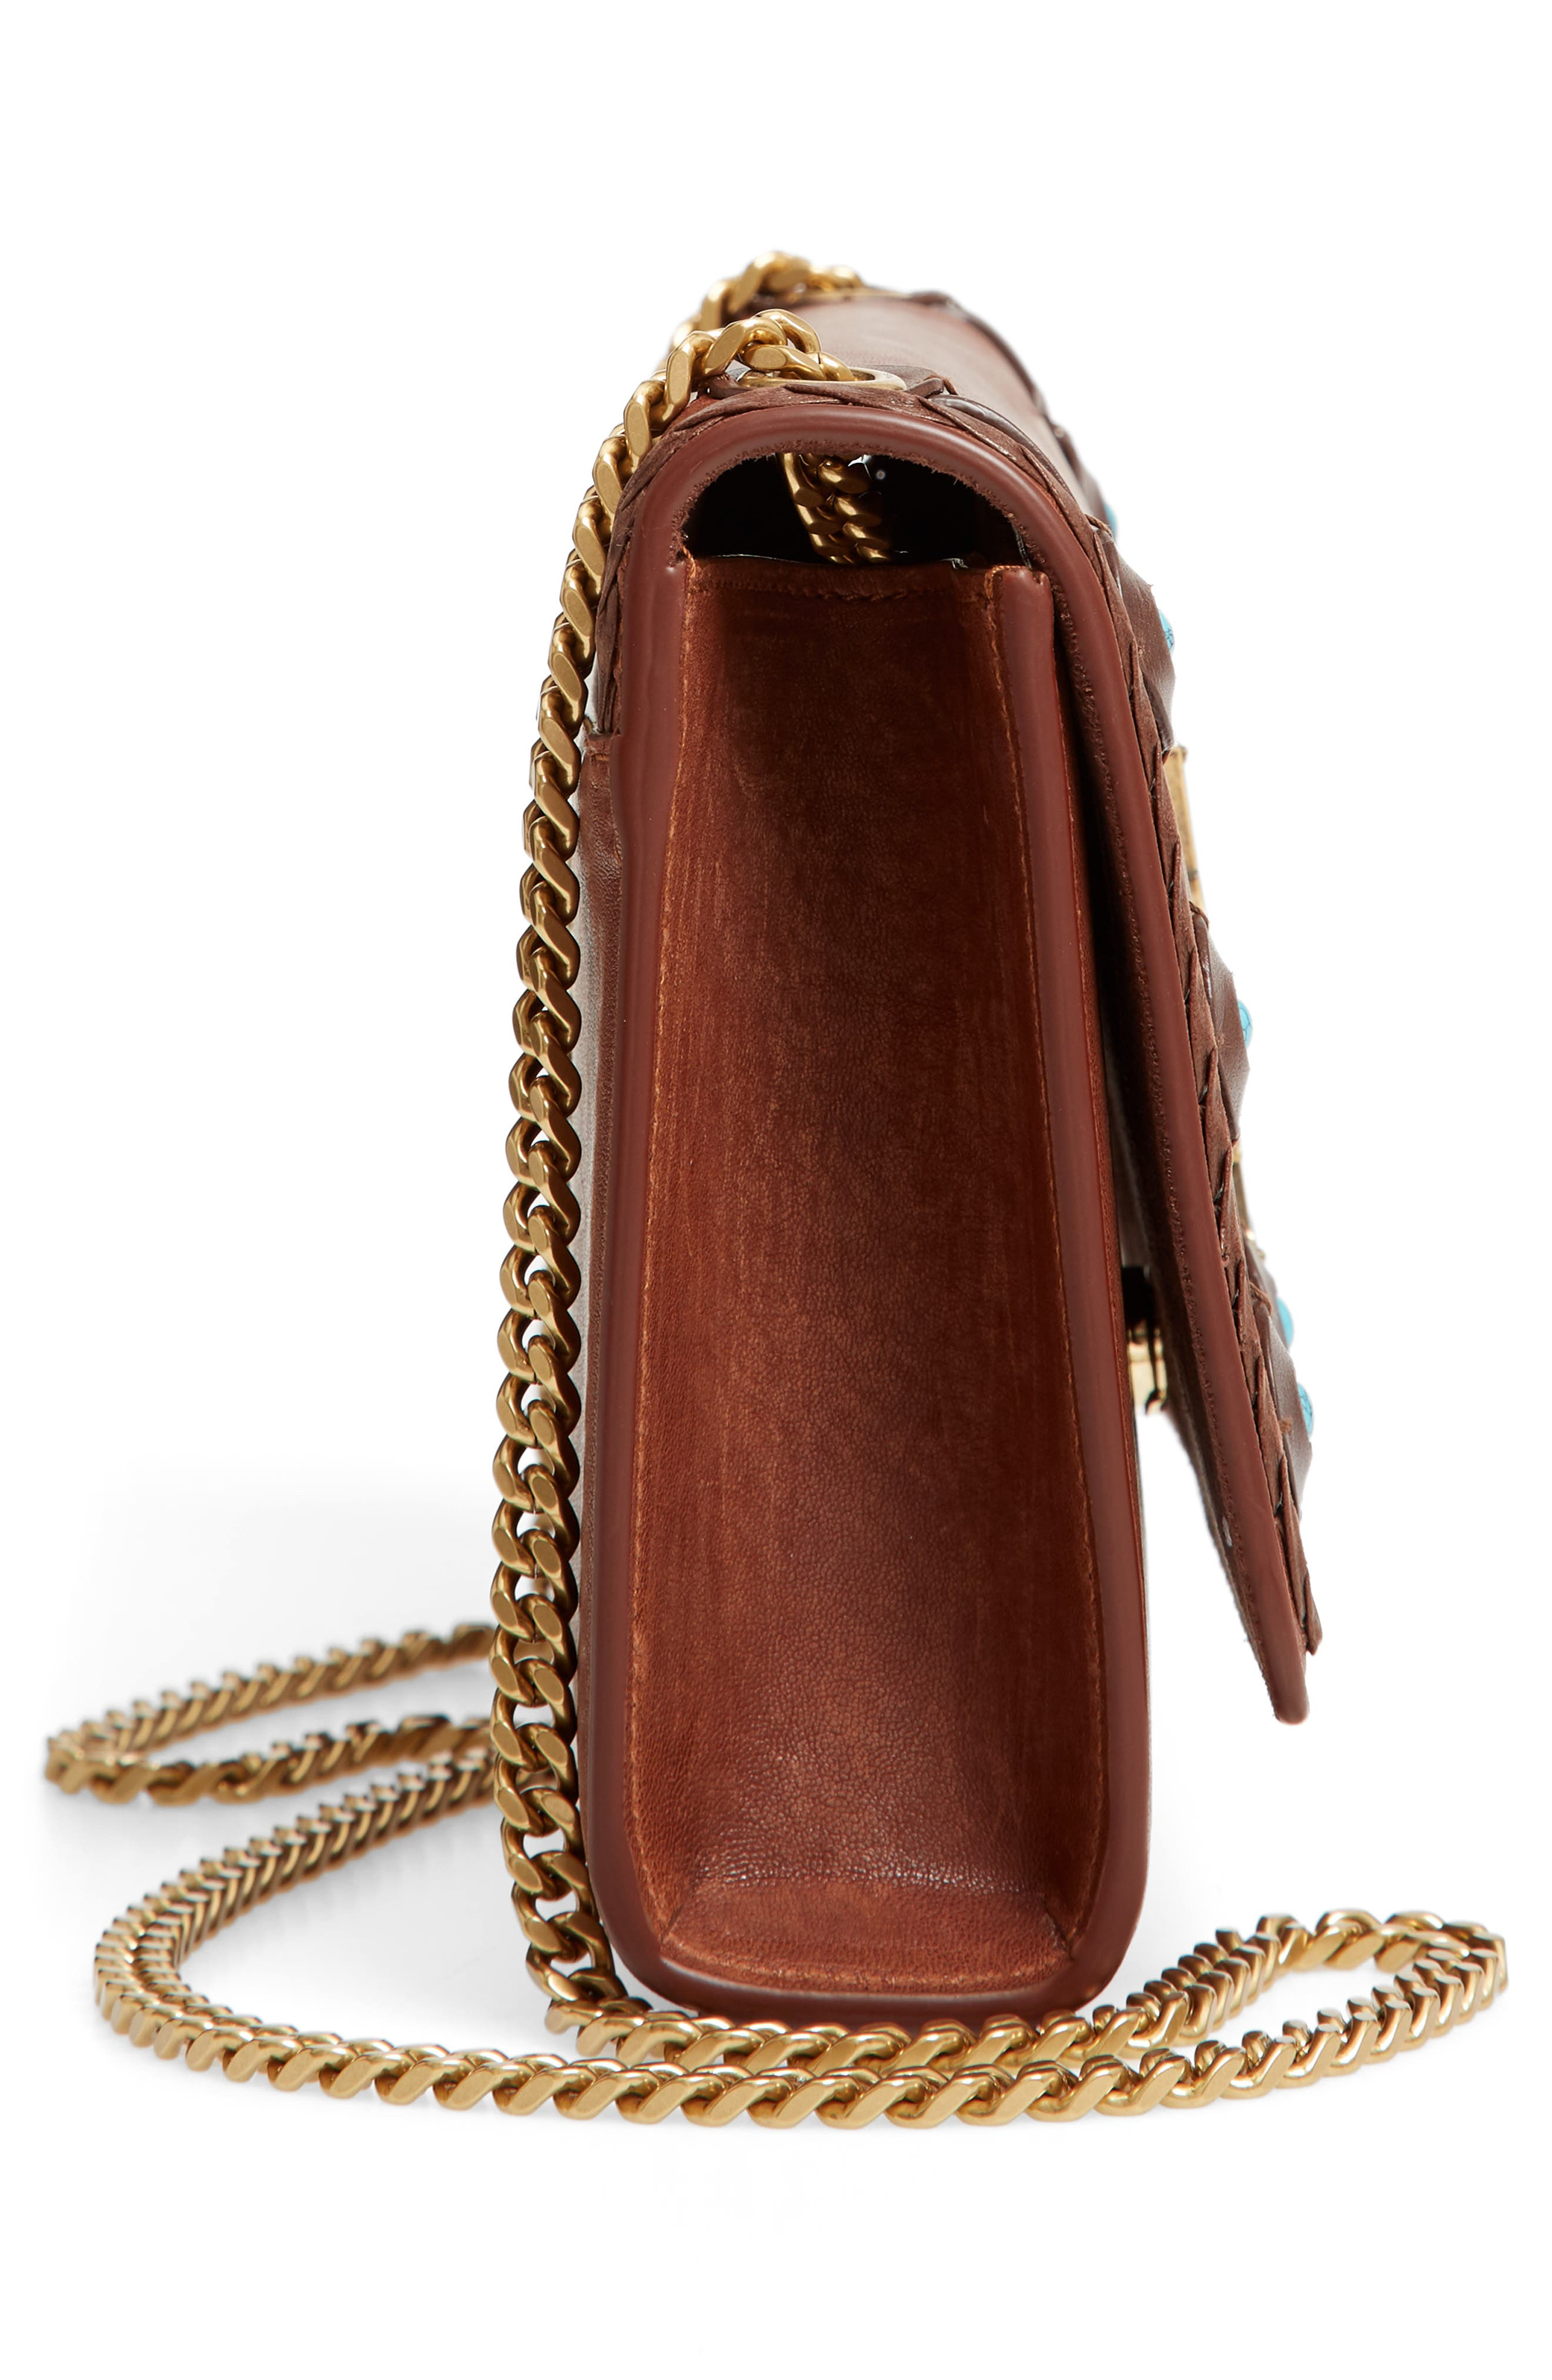 Medium Kate Studded Leather Crossbody Bag,                             Alternate thumbnail 5, color,                             BROWN MULTI